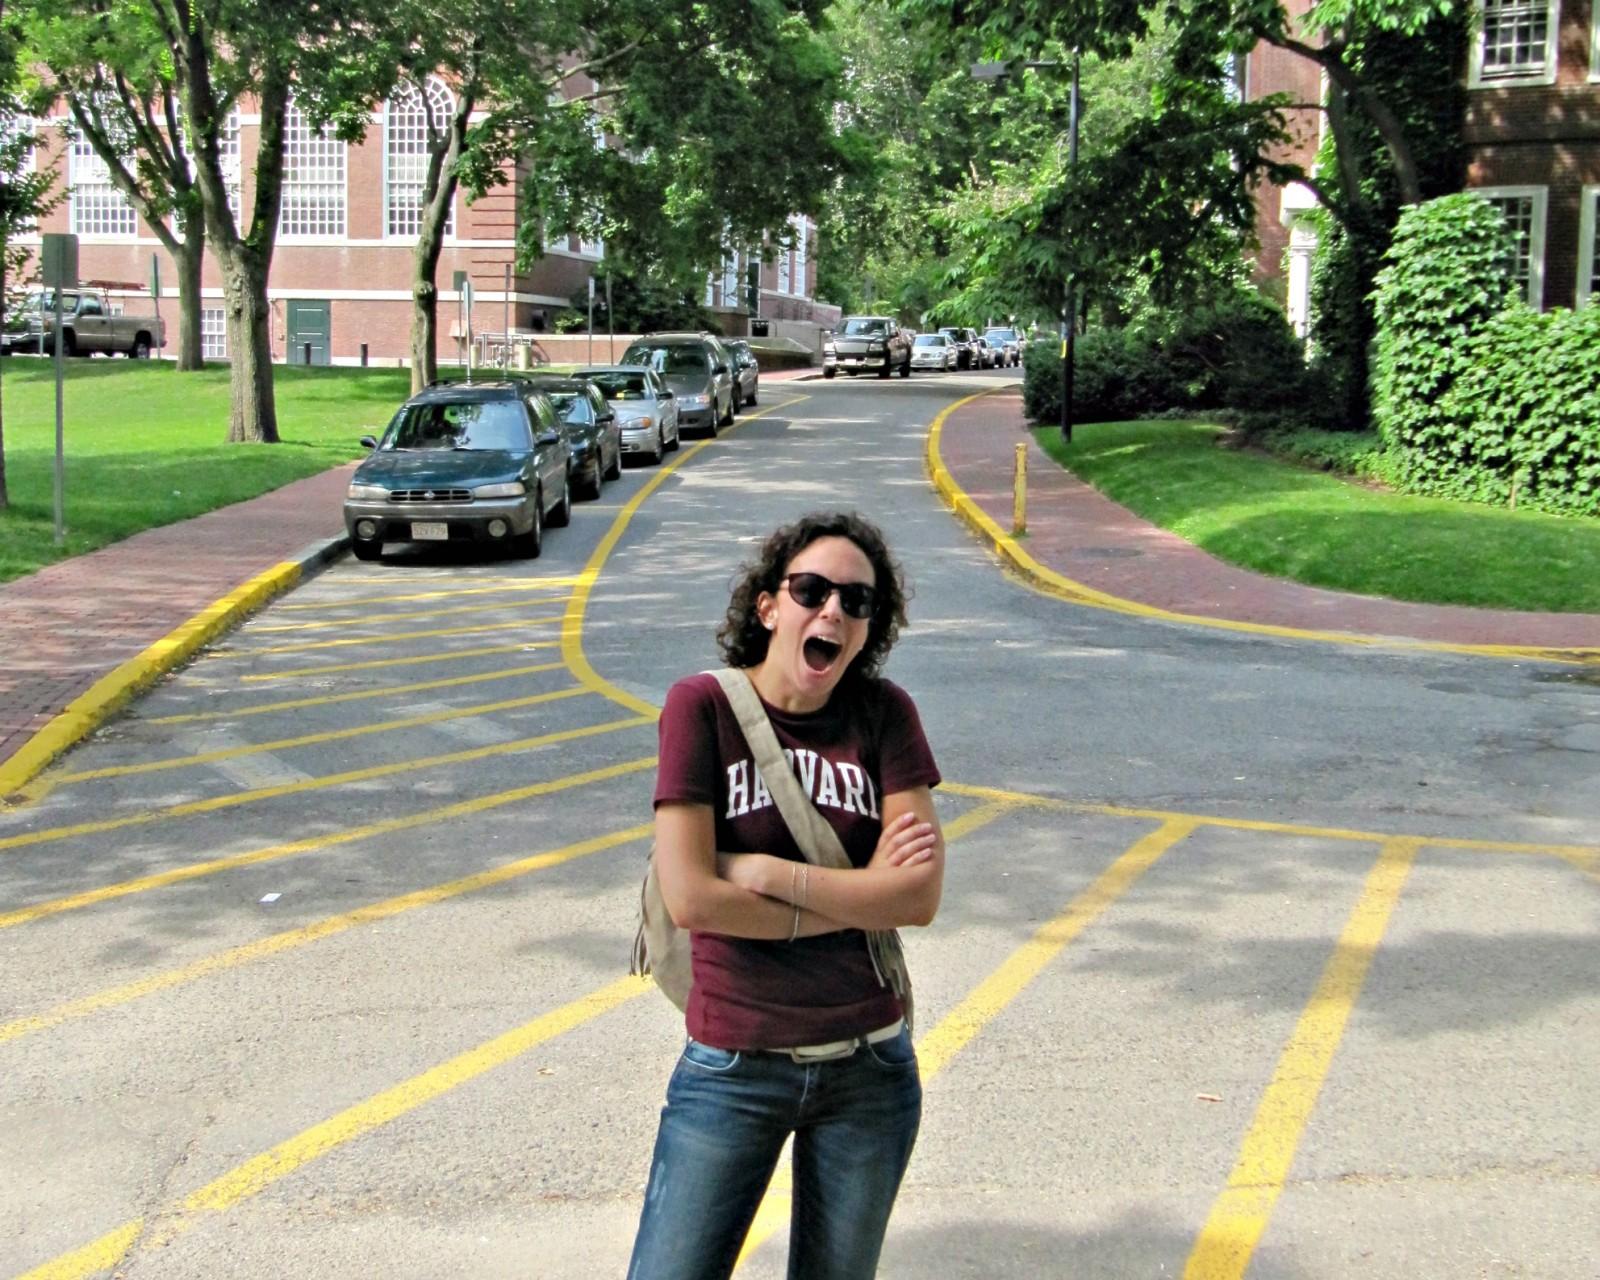 Harvard: Empire State Of Mind